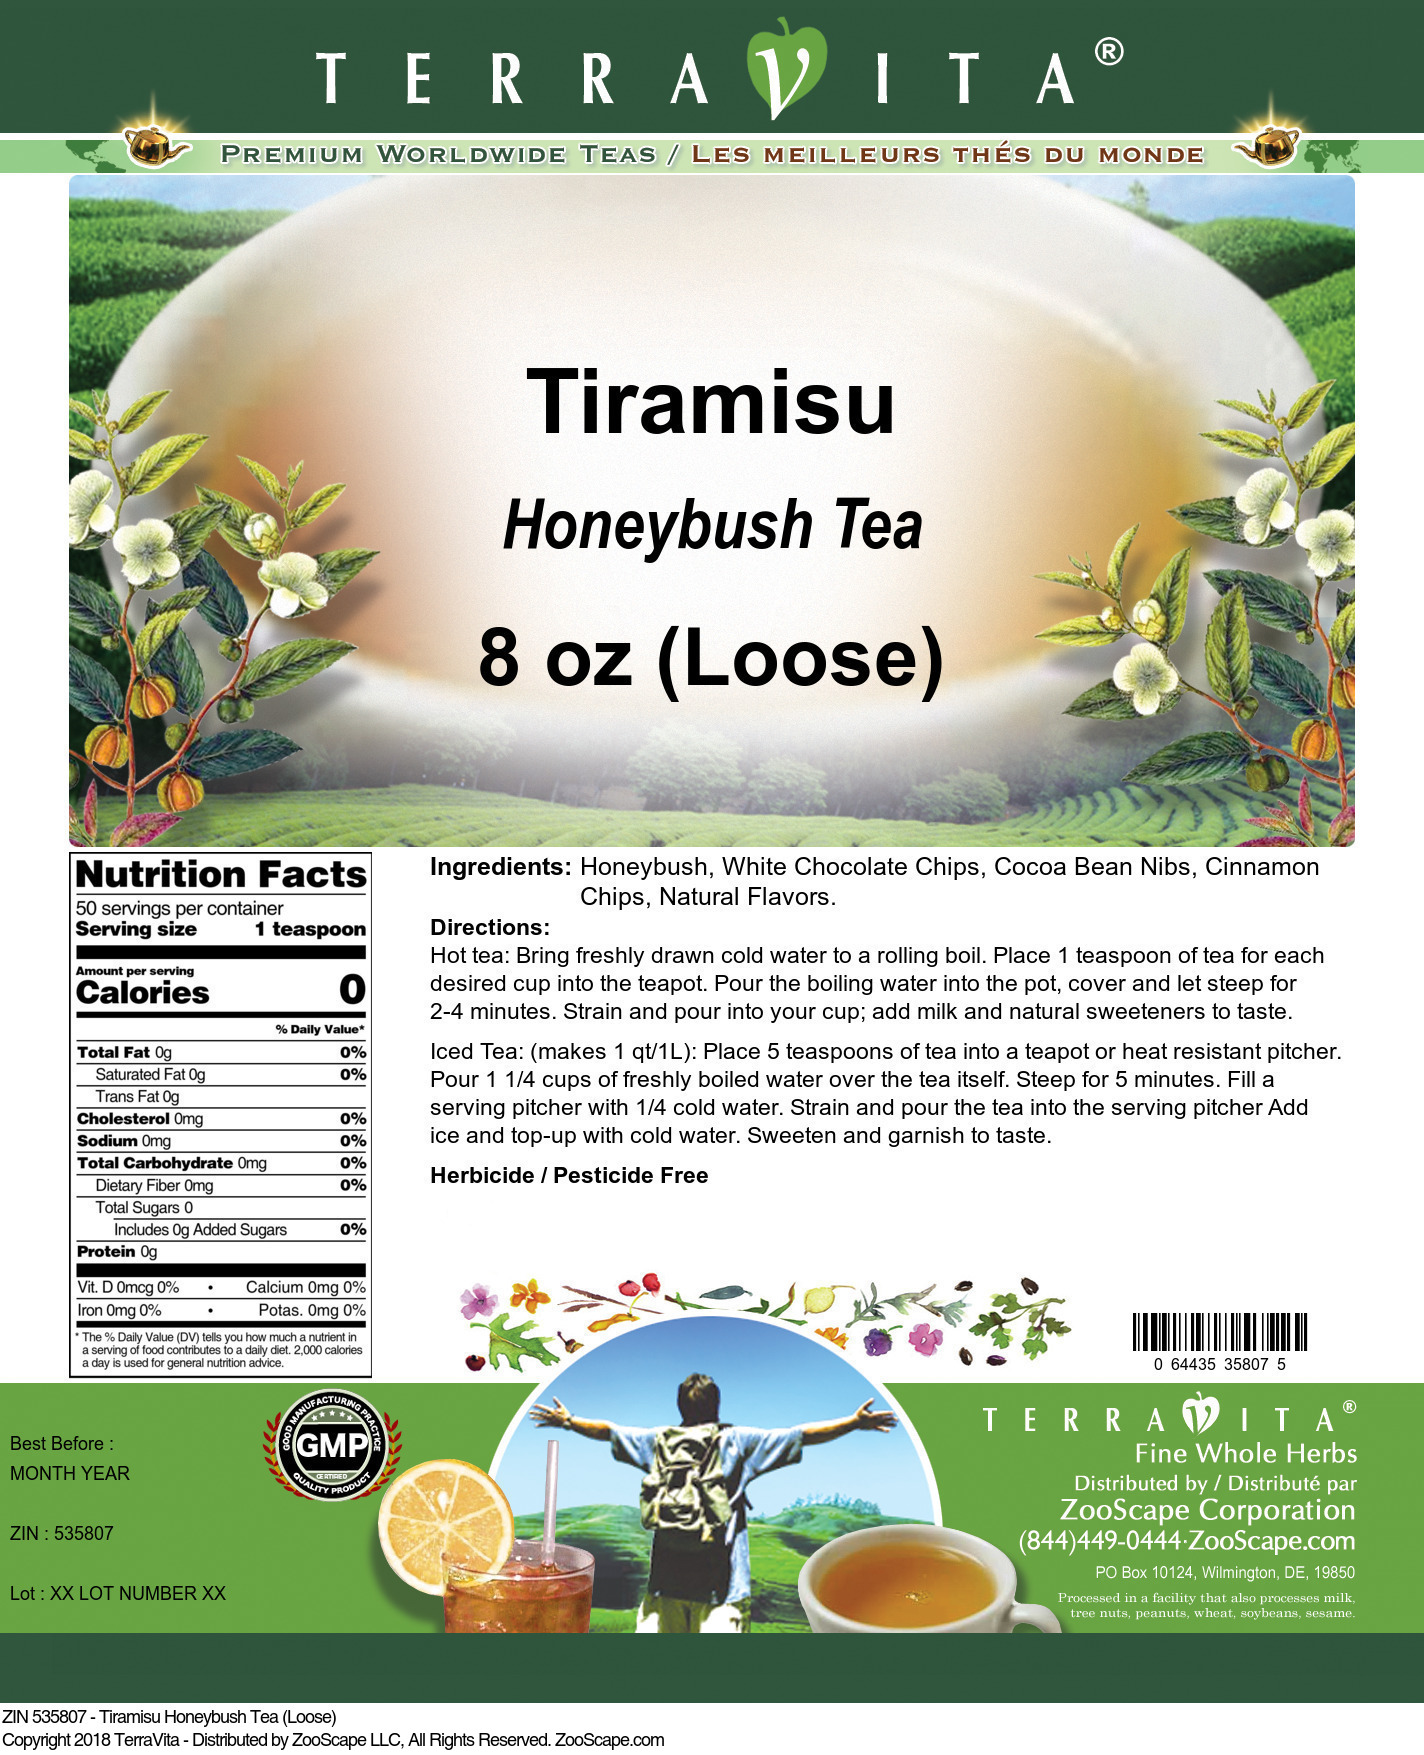 Tiramisu Honeybush Tea (Loose)